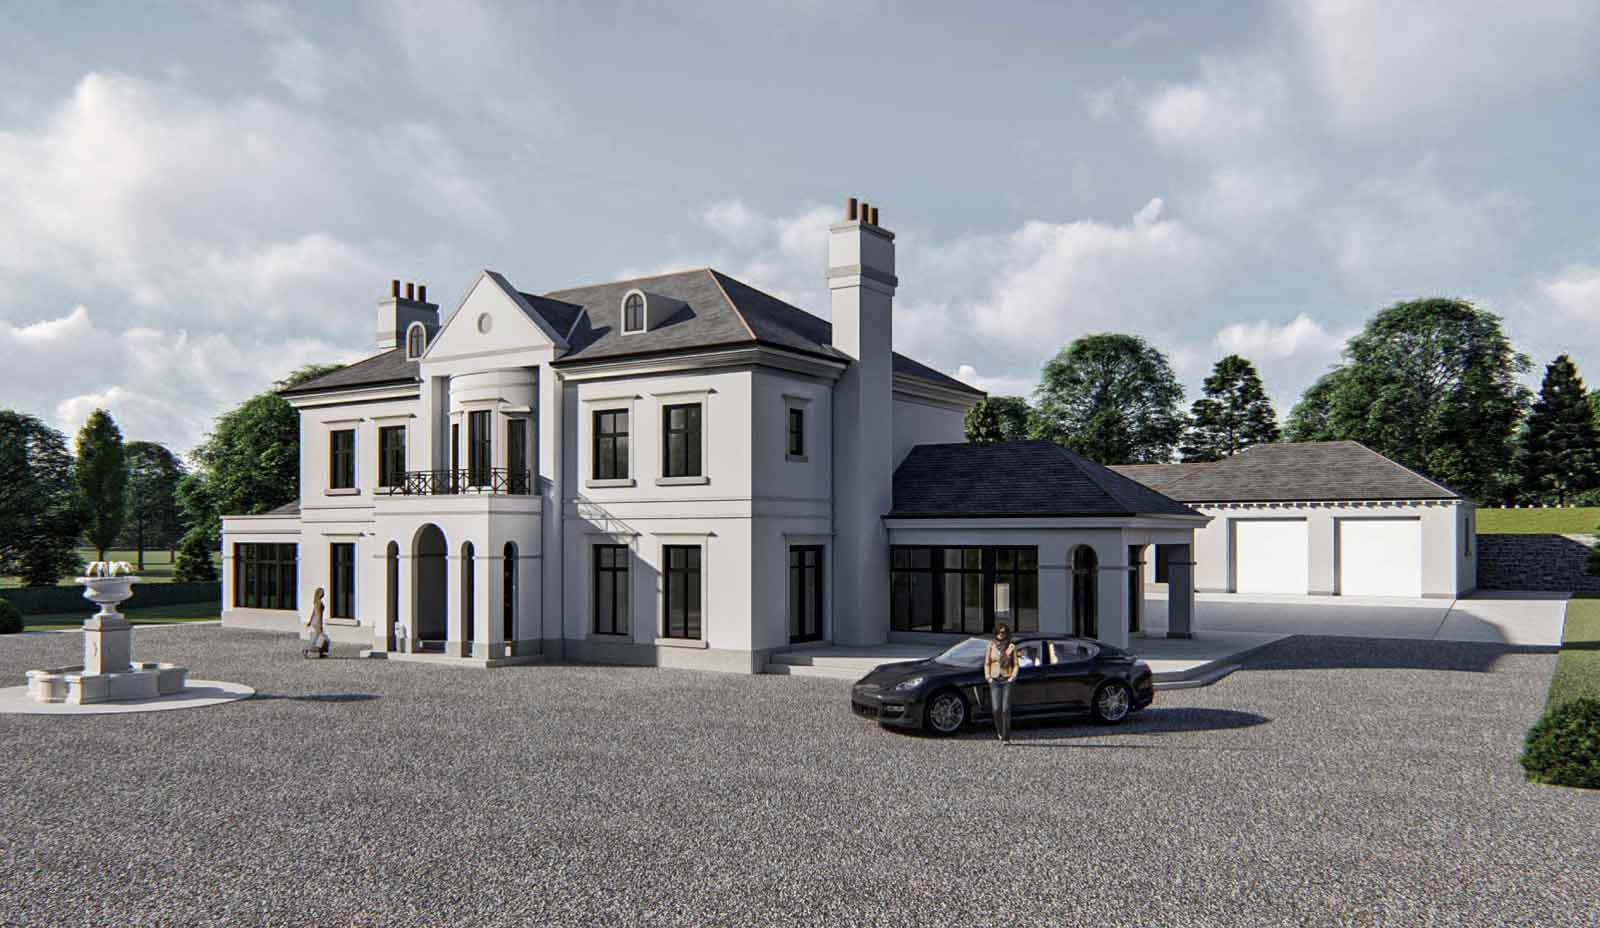 New Dwelling, Dublin